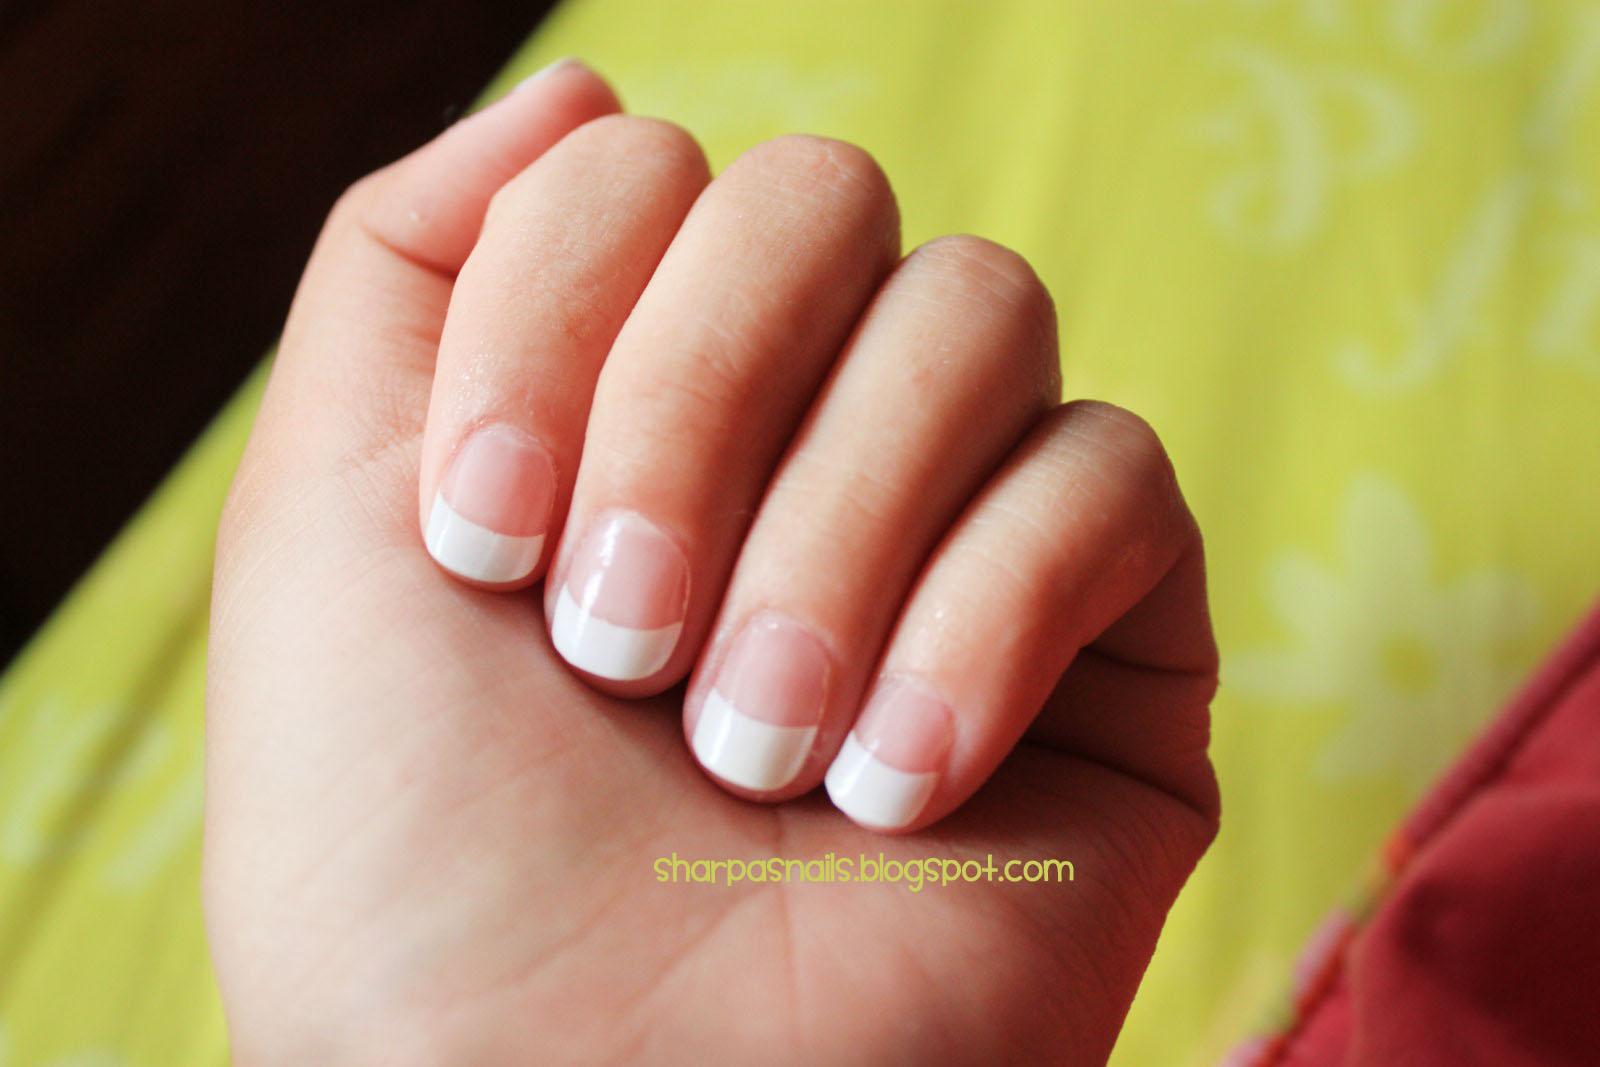 Sharp As Nails (A Nail Art Blog): French Manicure Acrylic ...